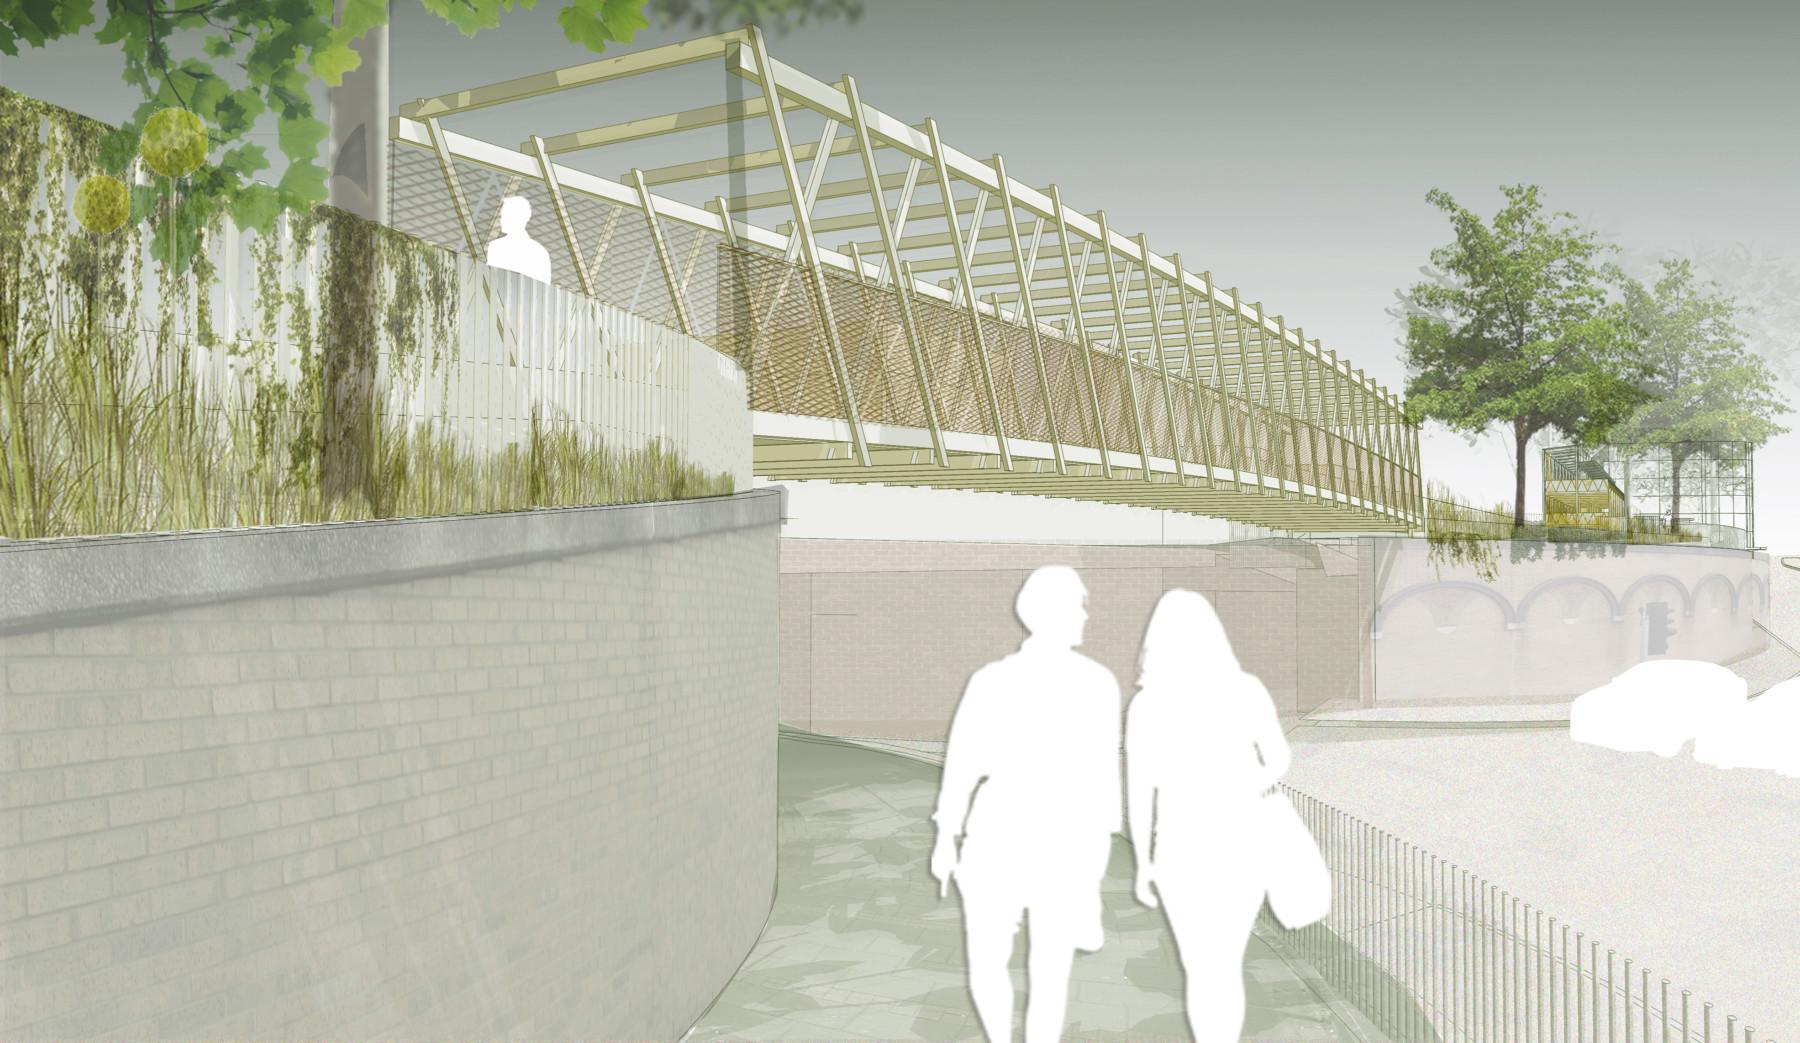 Sarah-Wigglesworth-Architects Kingston-Mini-Holland Bridge 1 Overall 3600